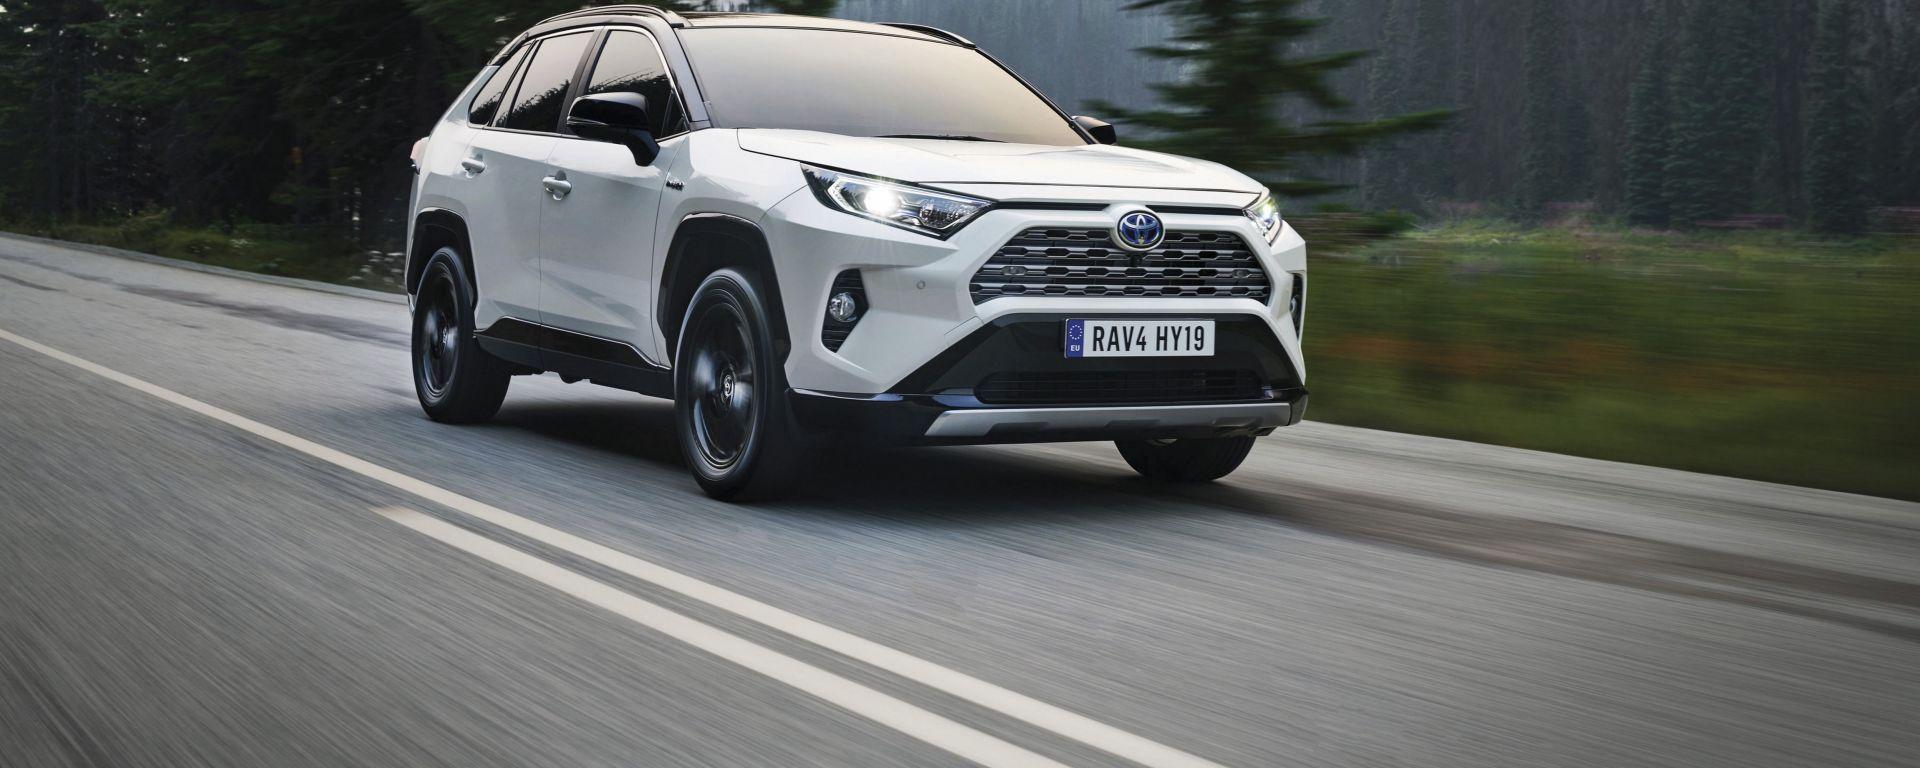 Toyota Rav4 Hybrid 2019: su strada col SUV ibrido